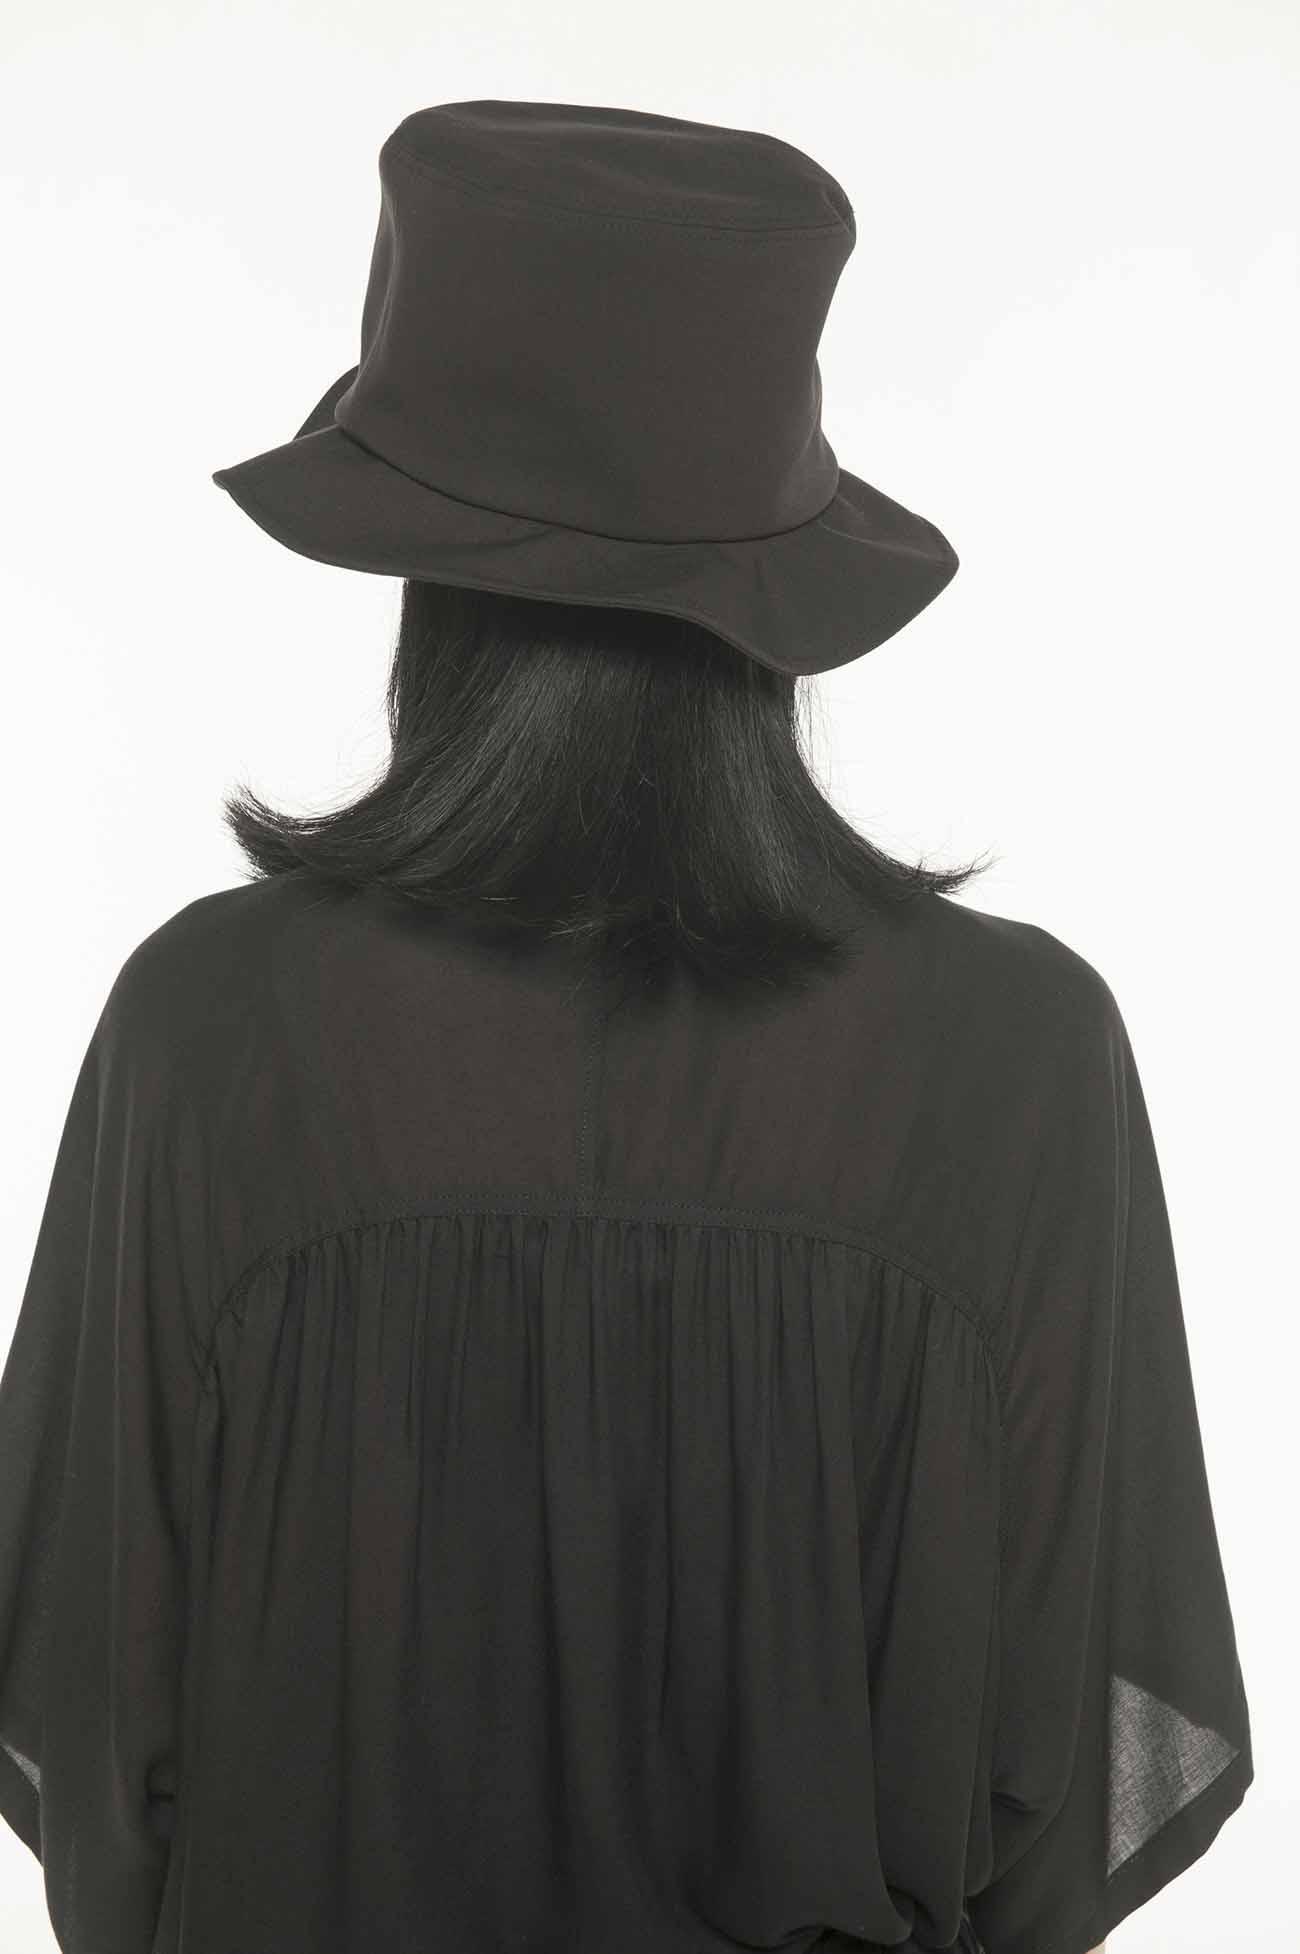 Pe/Rayon Gabardine Stretch Flat Top Circular Hat